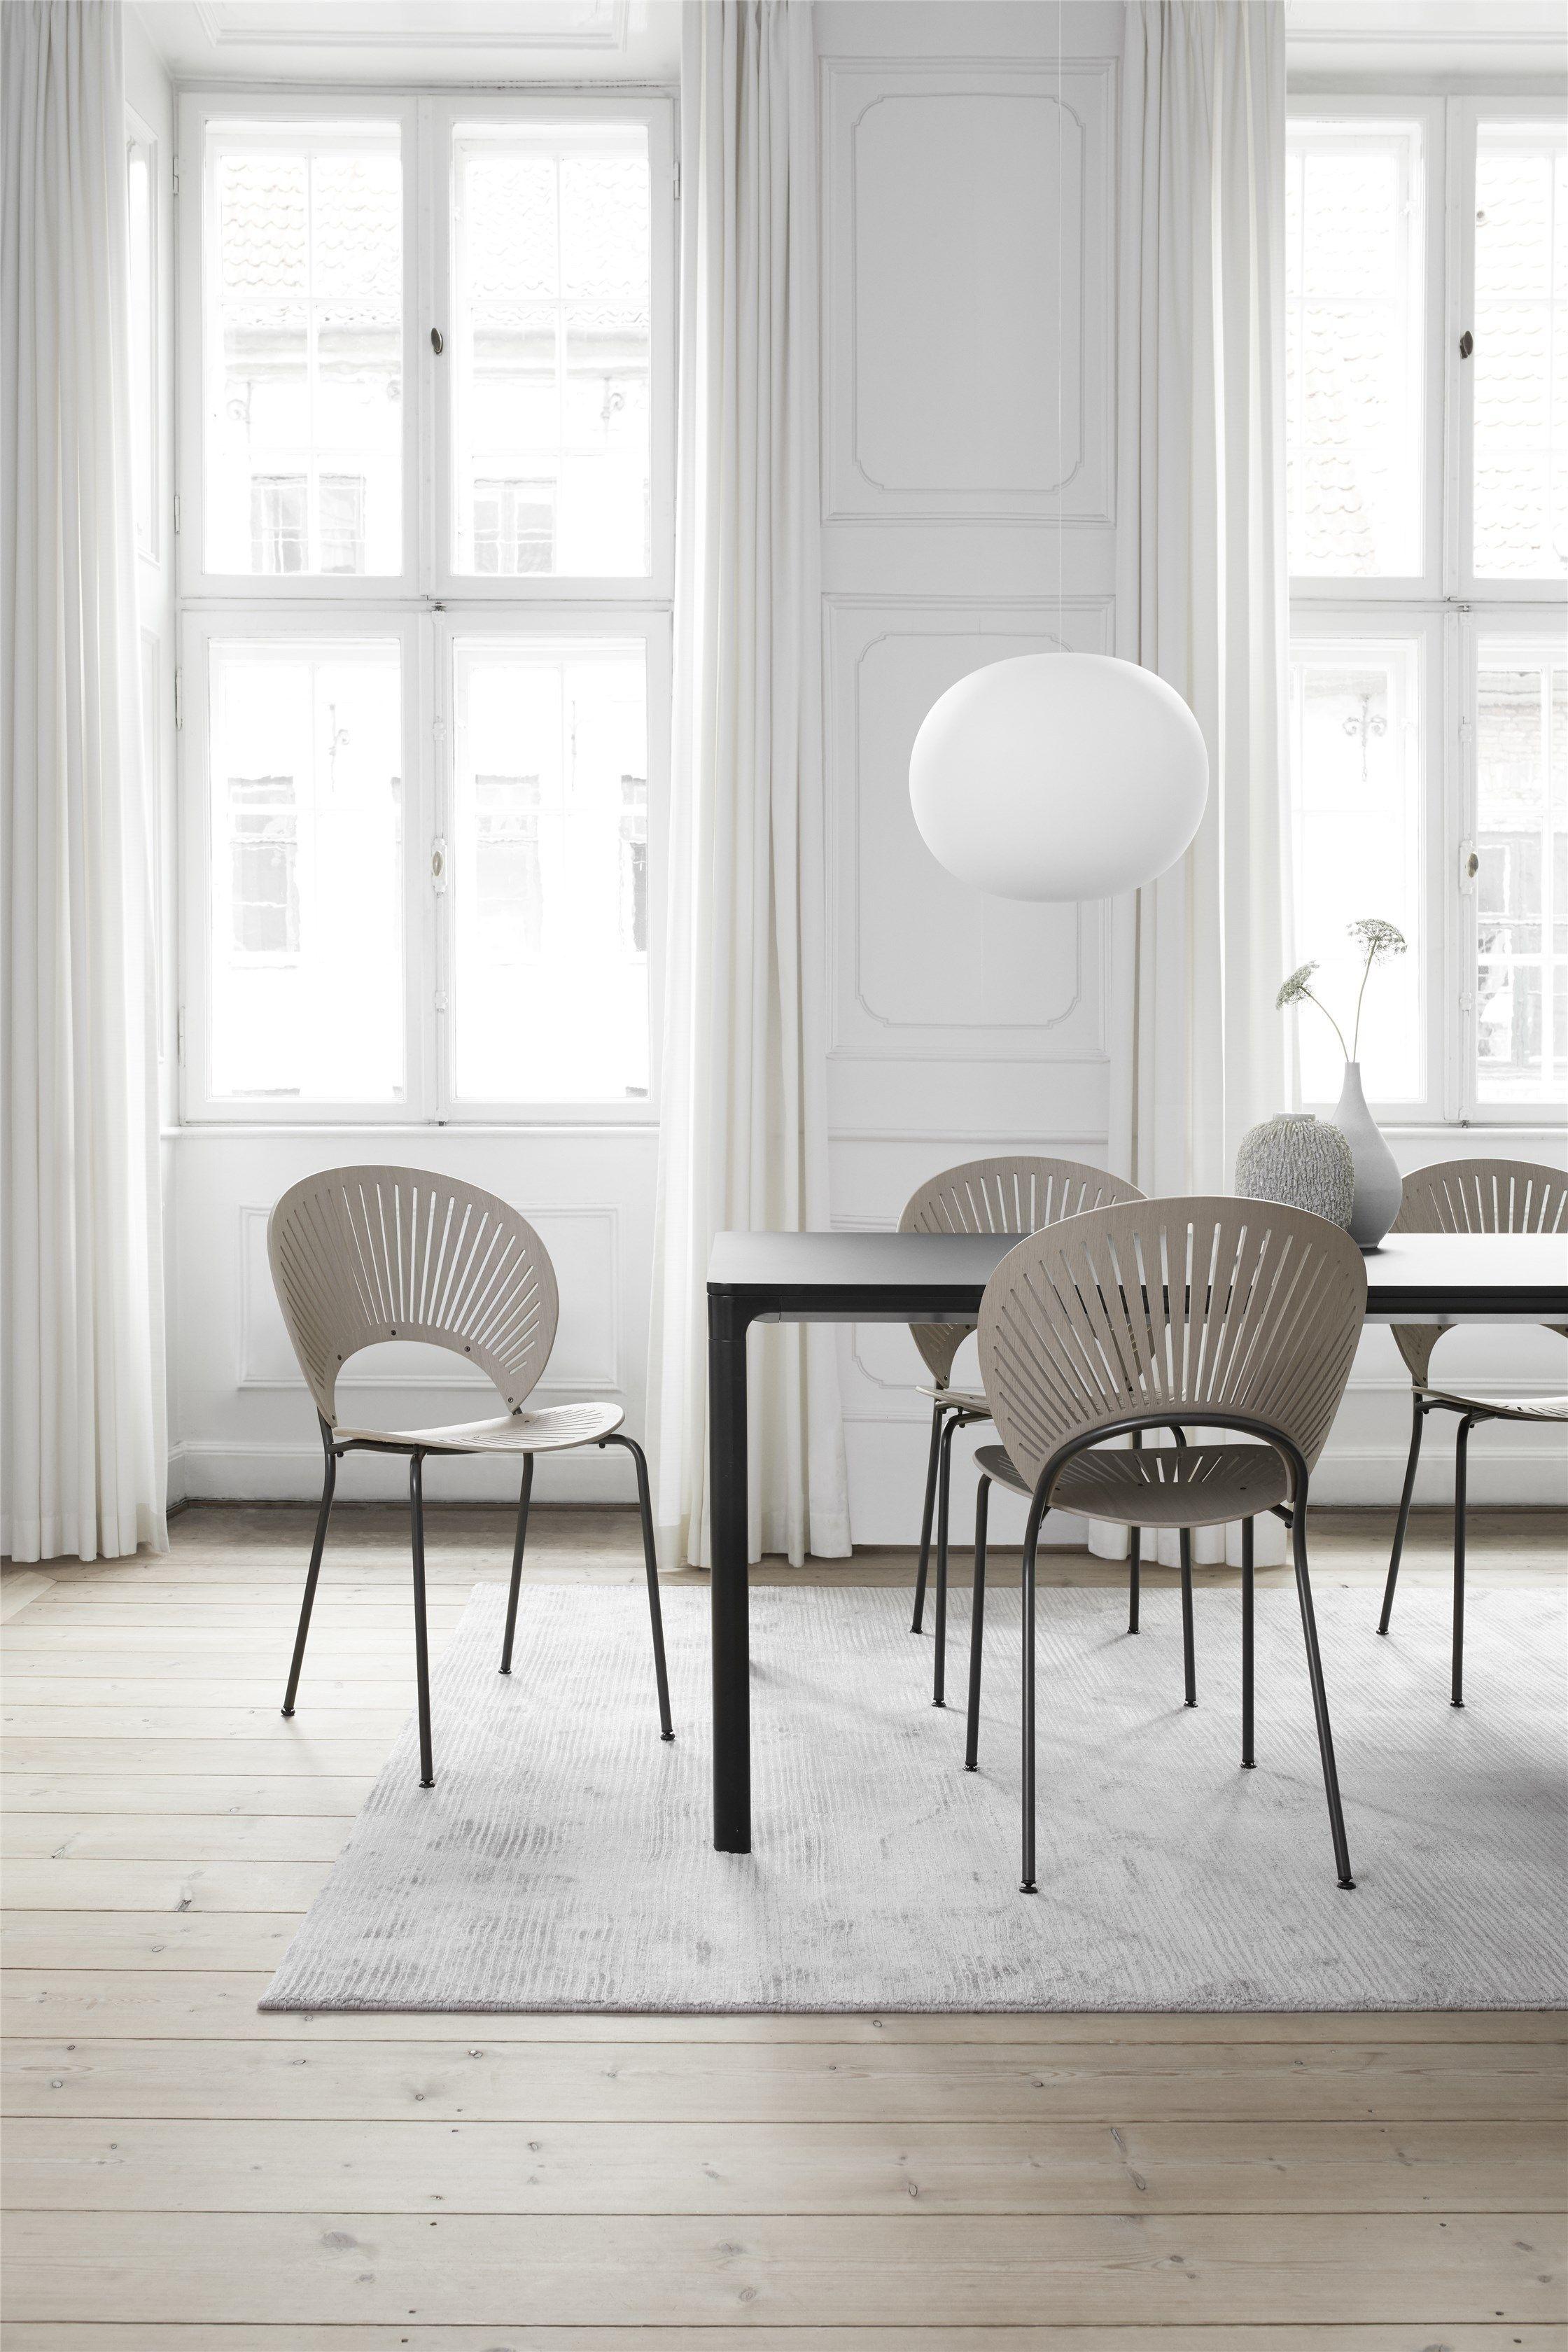 The home of interior designer louise liljencrantz      comedores interiores decoracion living also rh ar pinterest